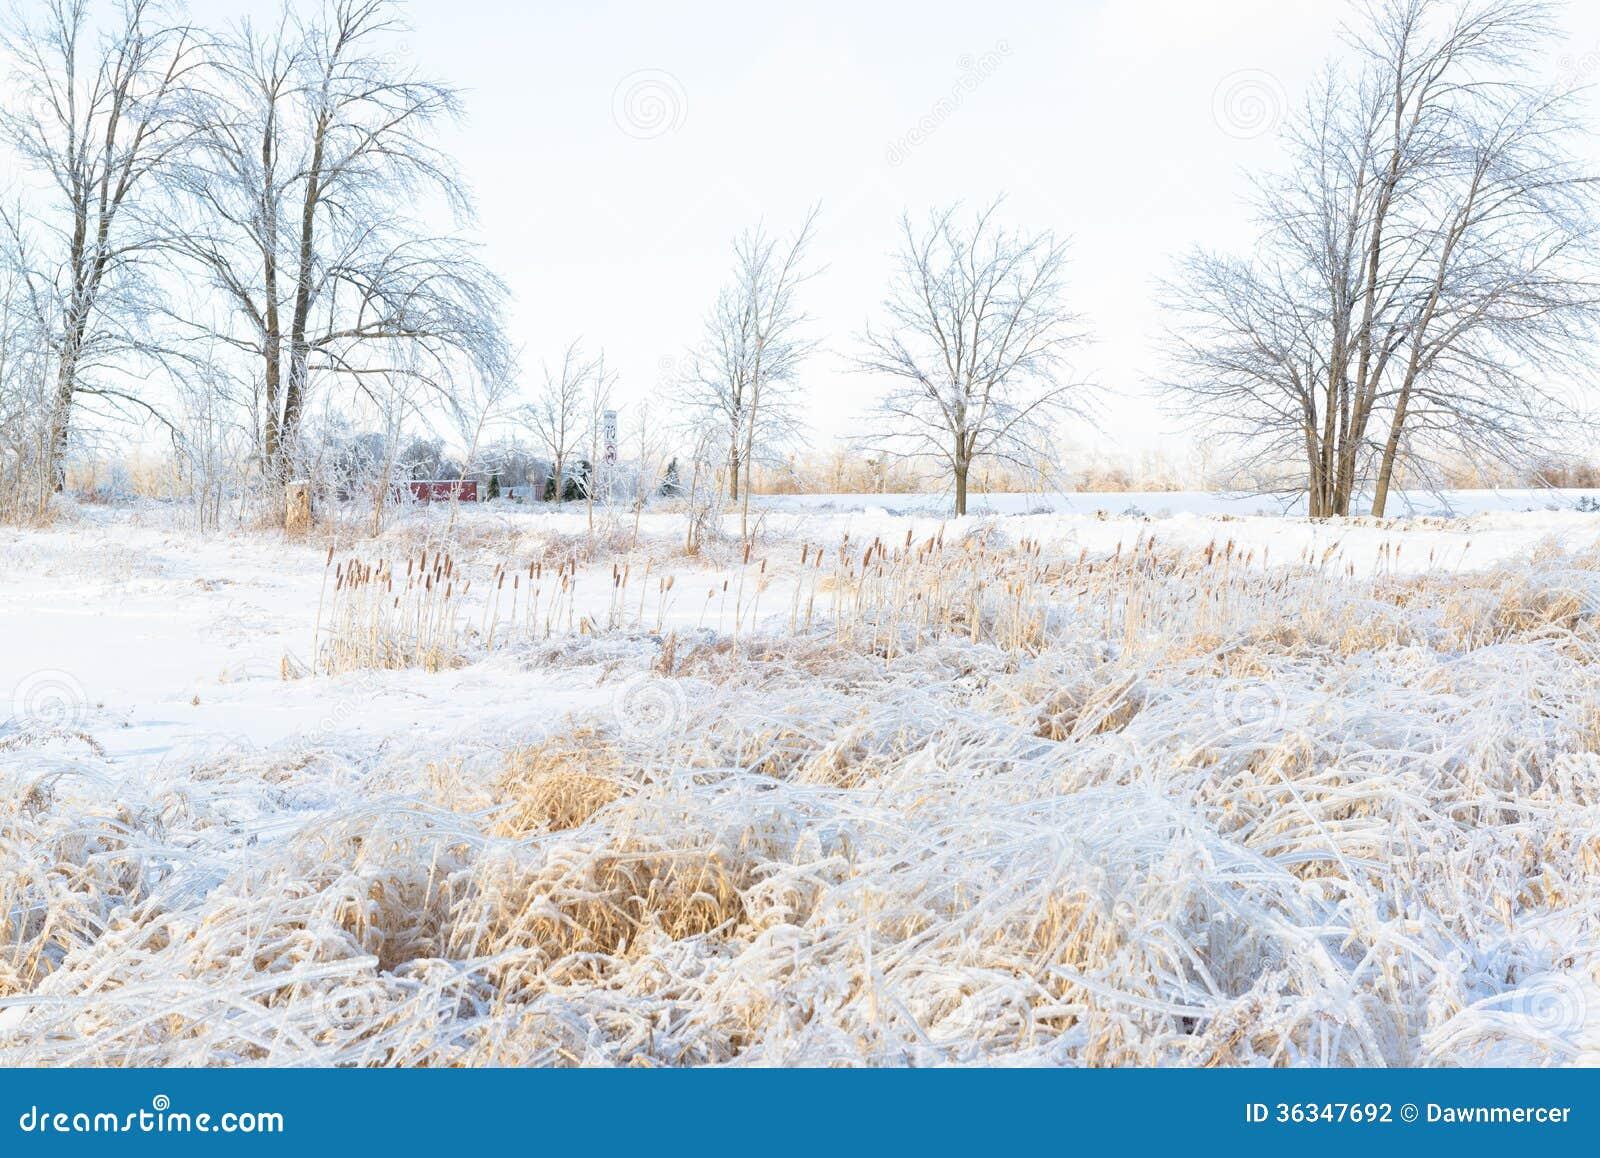 Christmas Tree Farm Prices